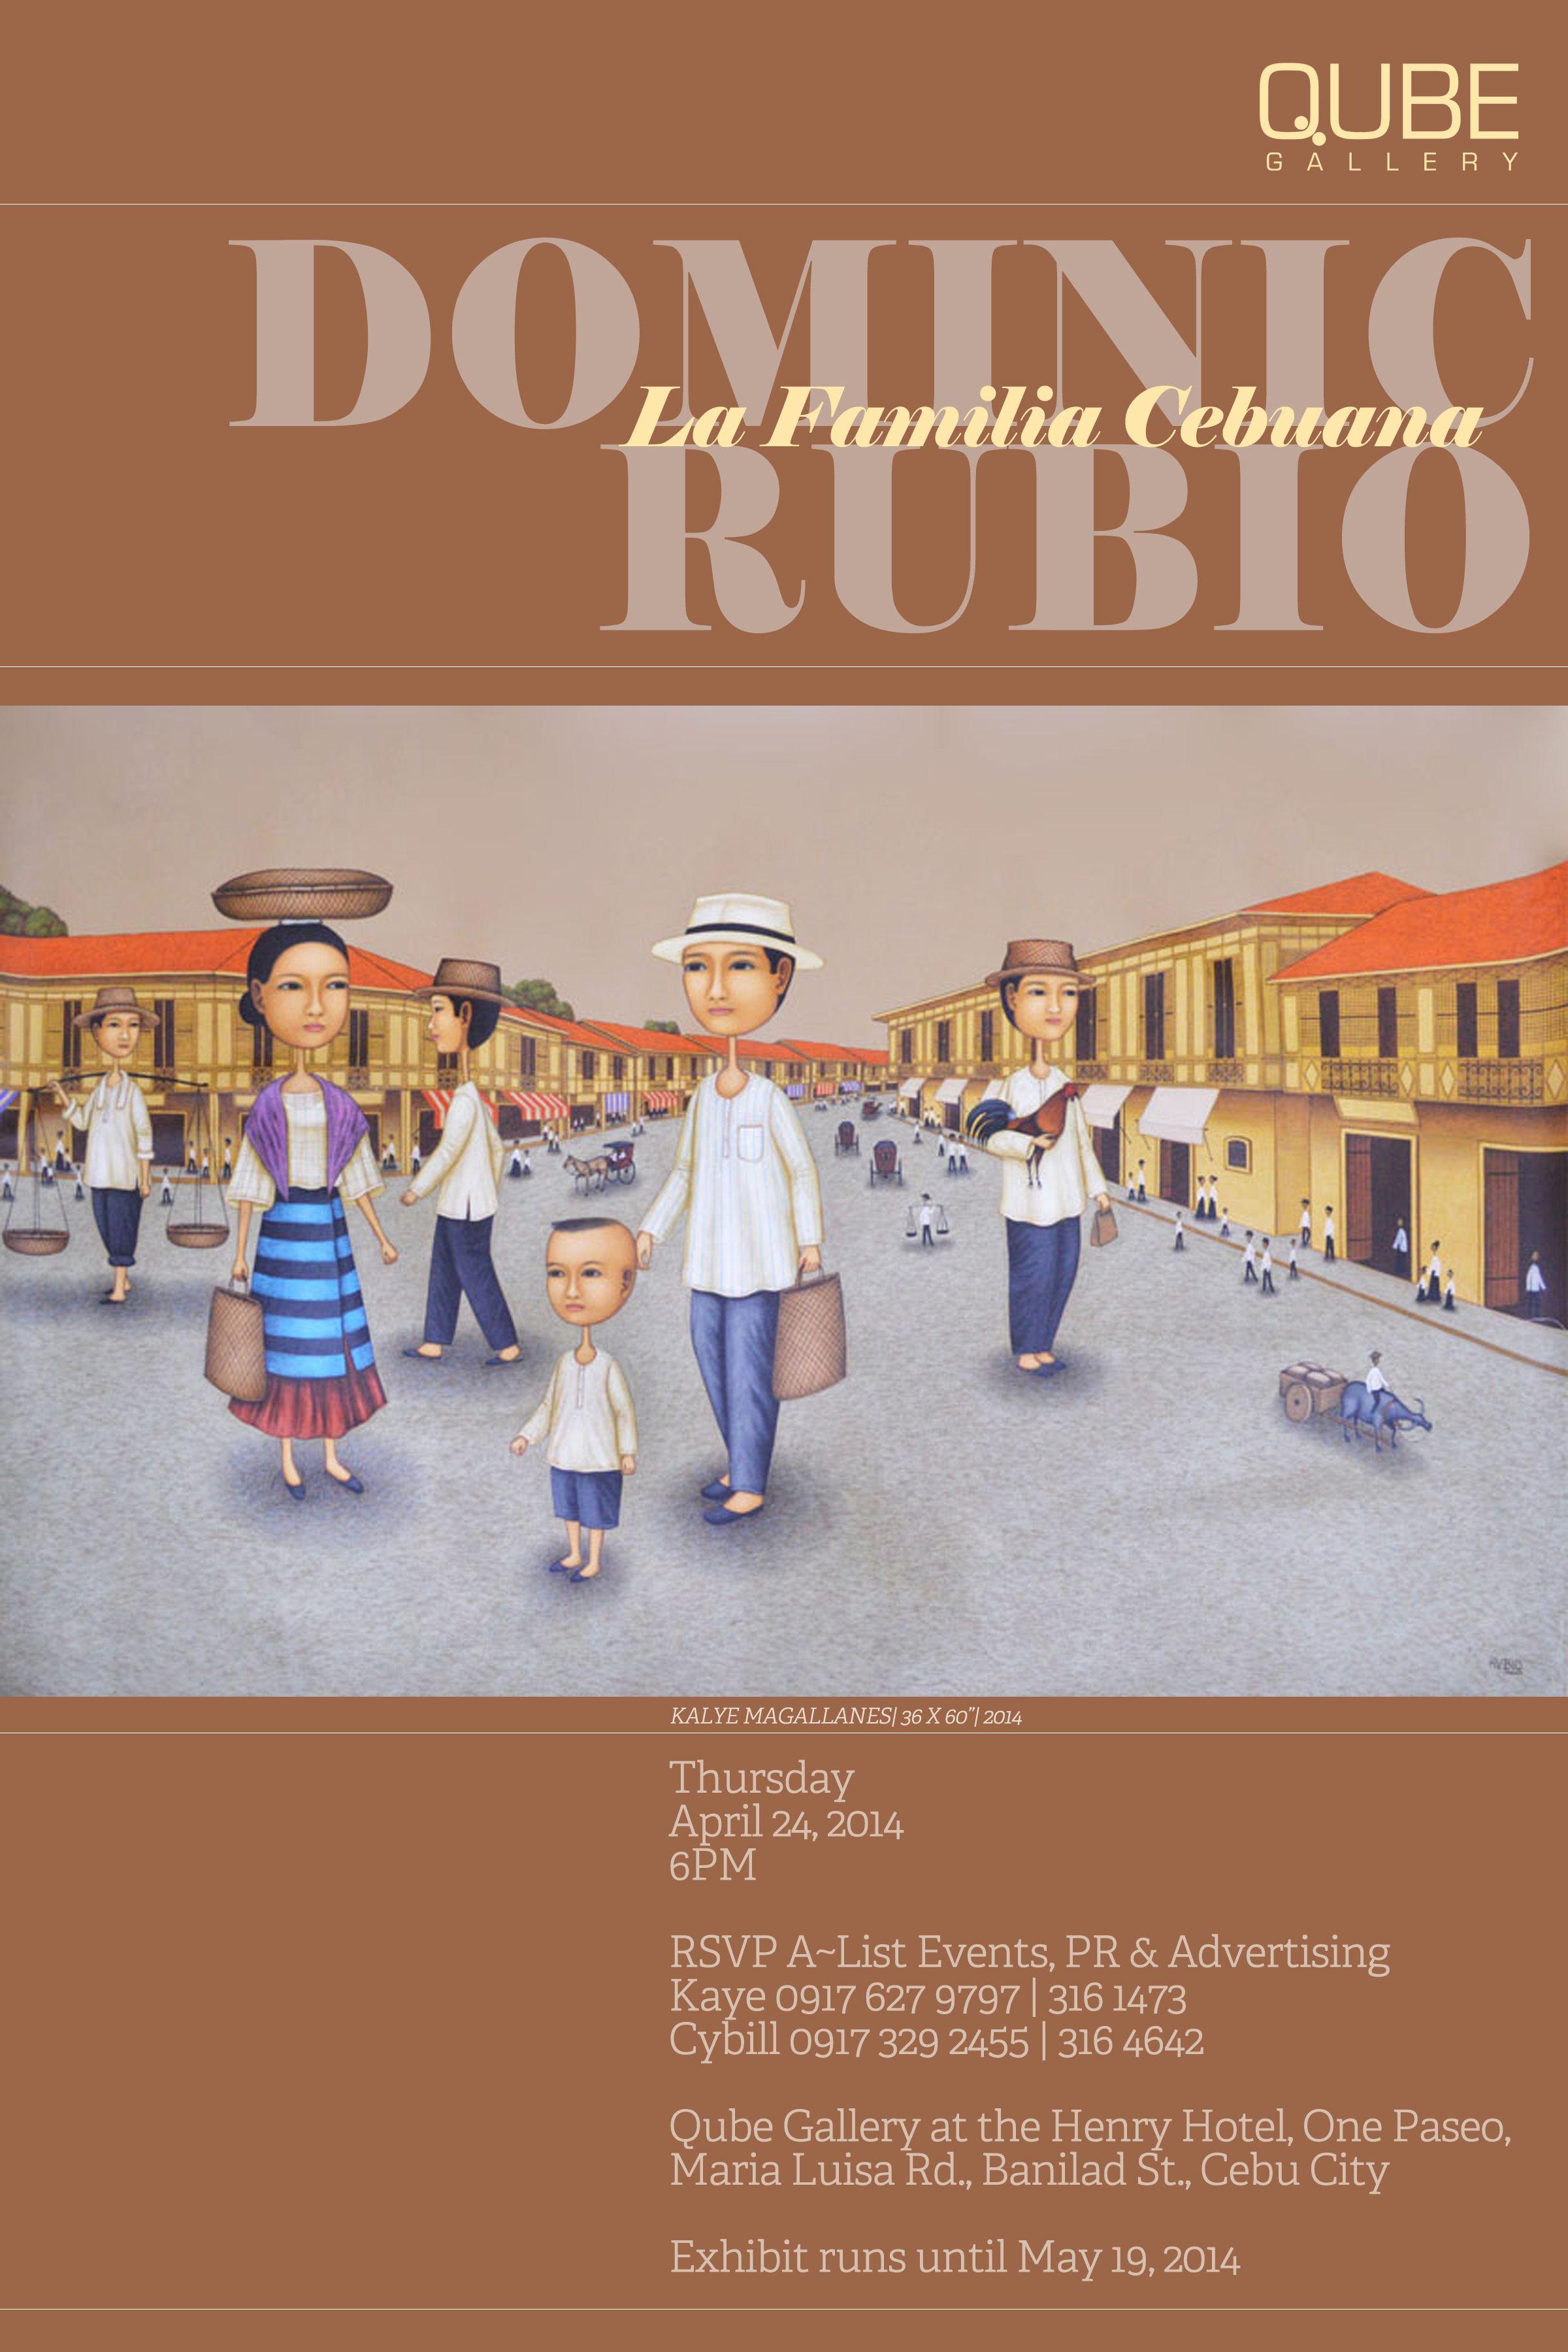 QUBE GALLERY Filipino art, Artist, Parol